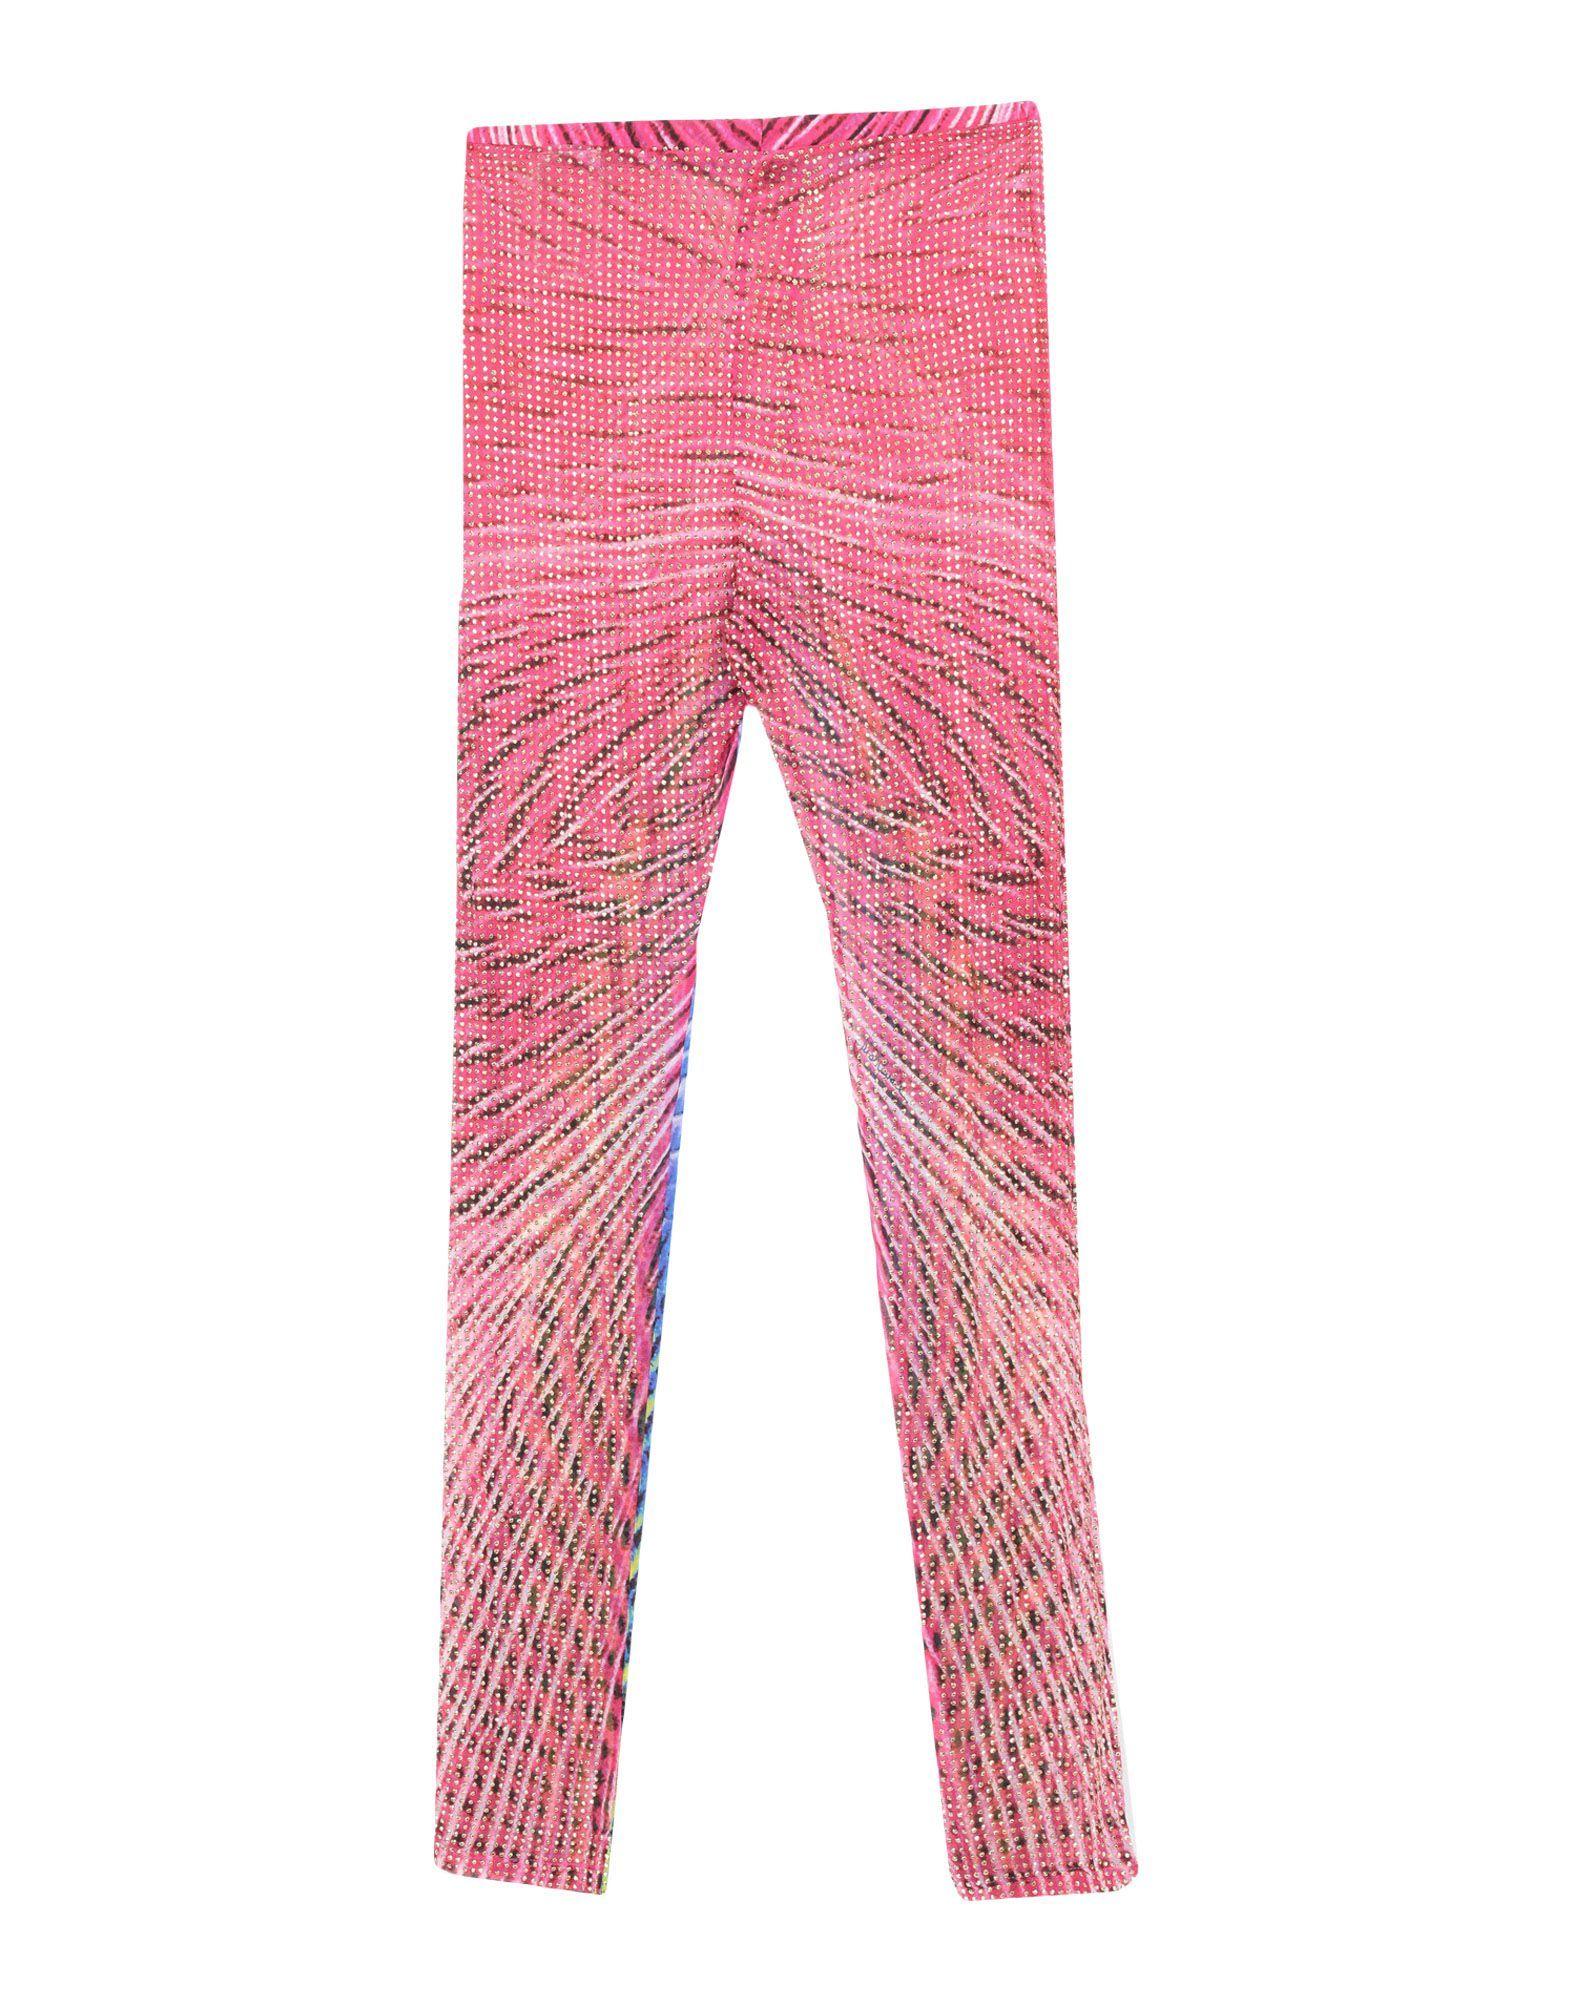 Just Cavalli Fuchsia Print Silk Leggings